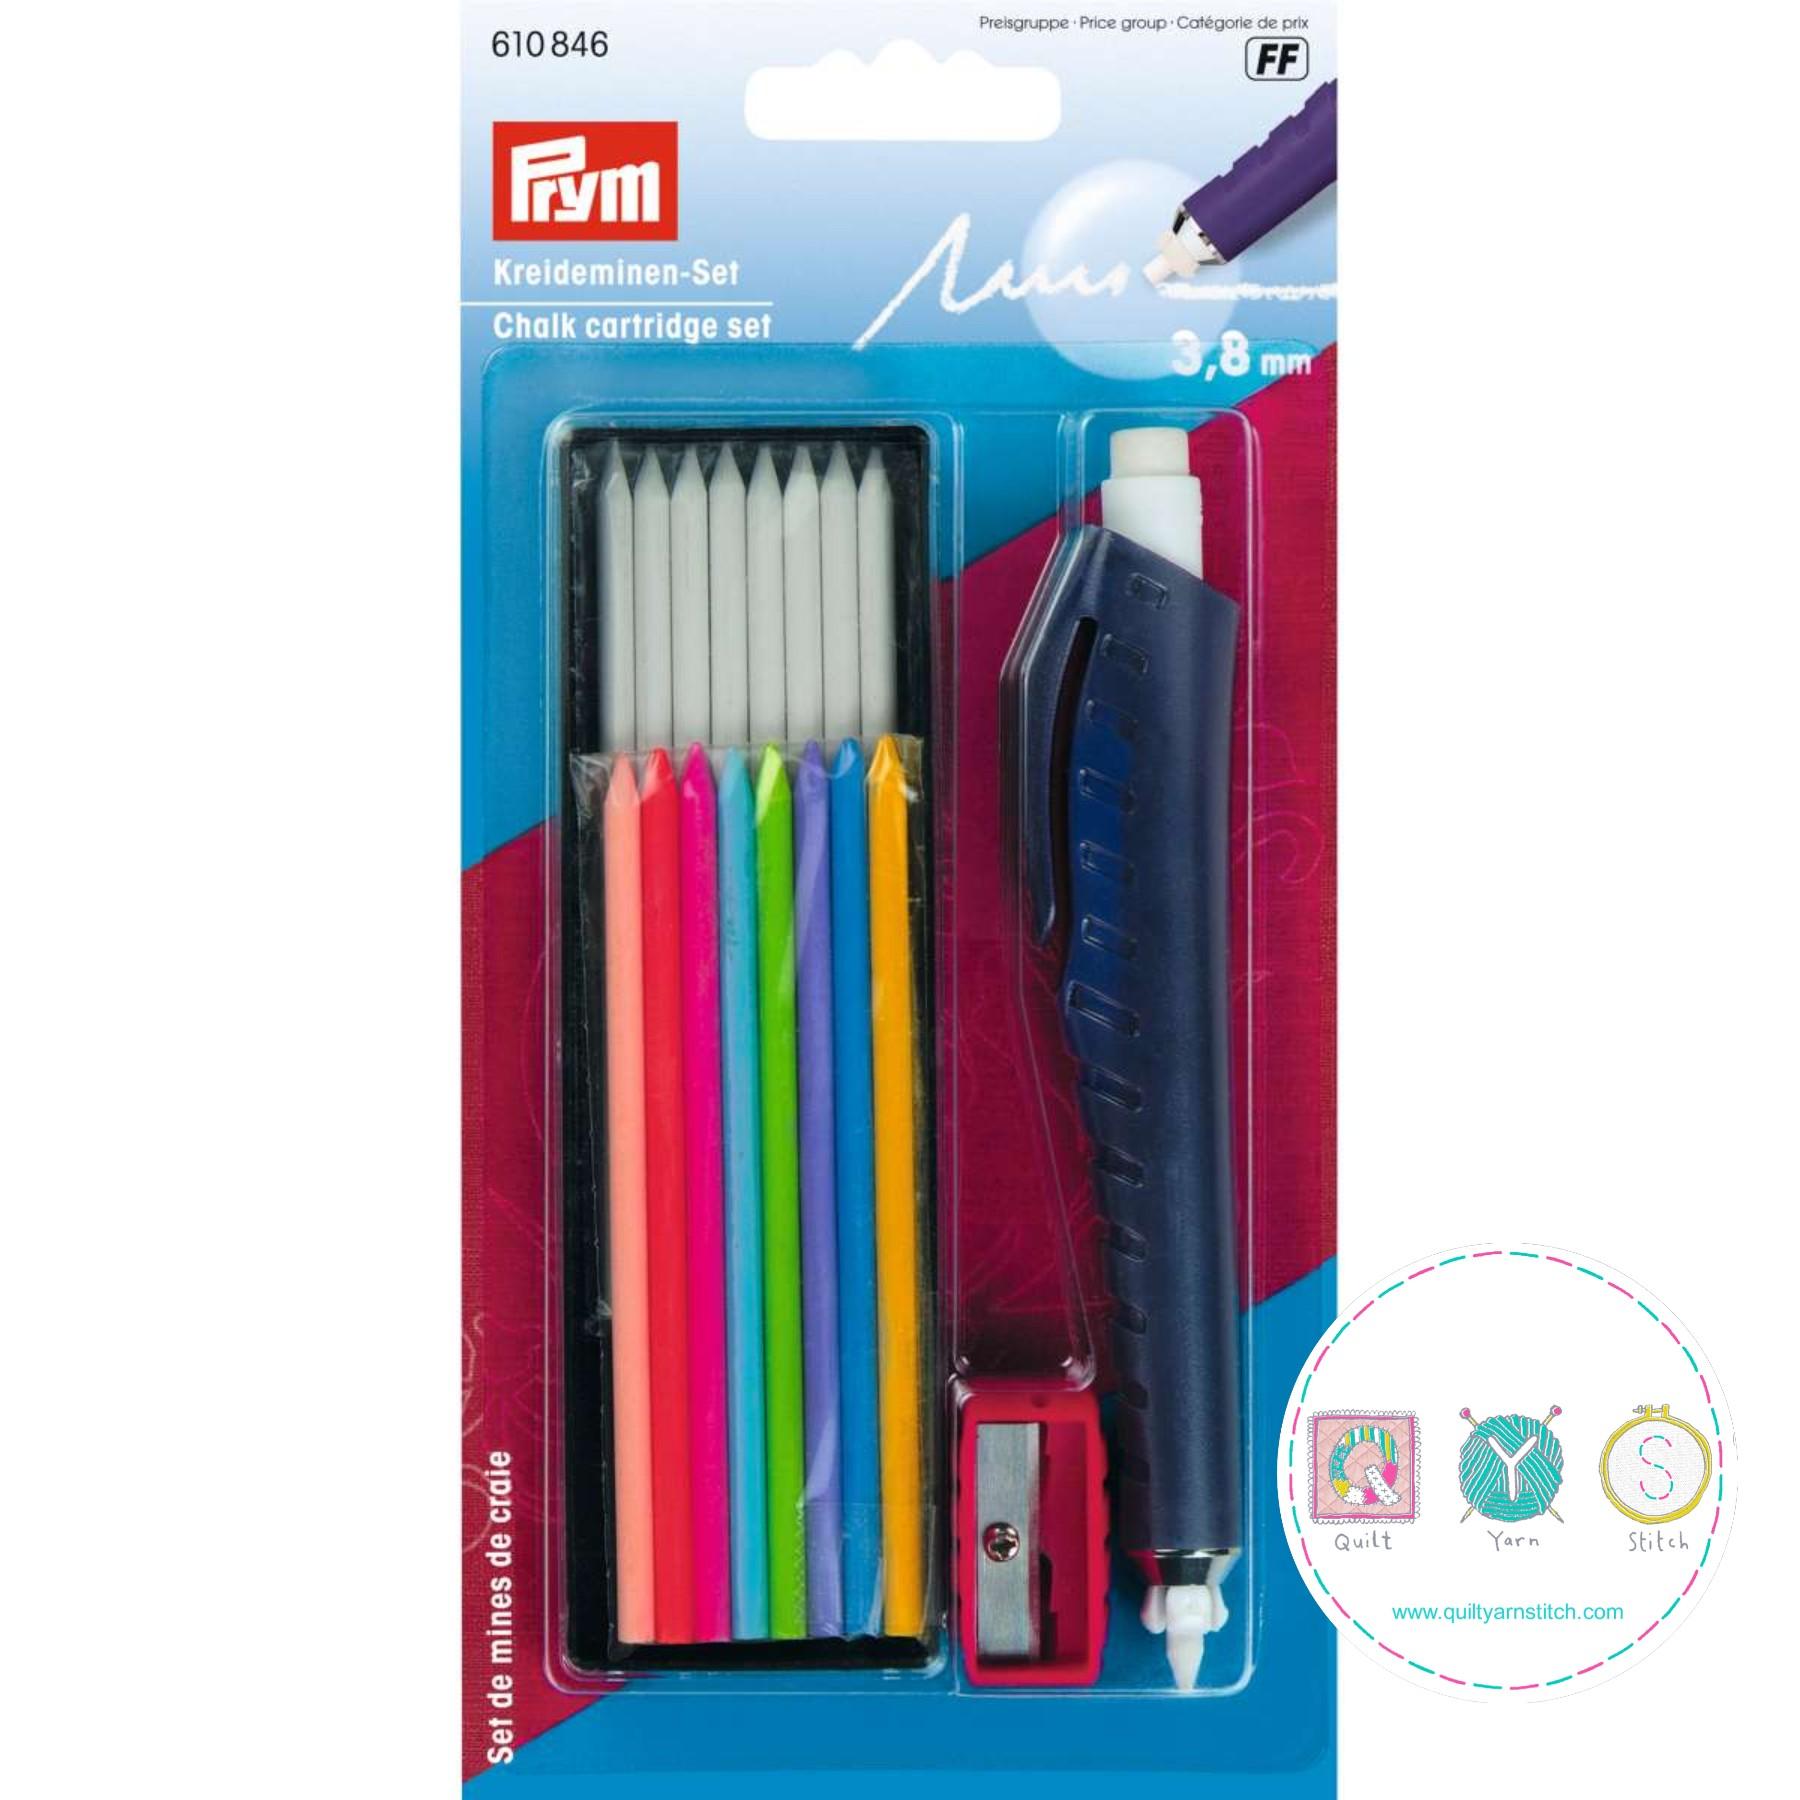 Prym 610846 Chalk Cartridge Set for Dressmaking, Patchwork and Quilting